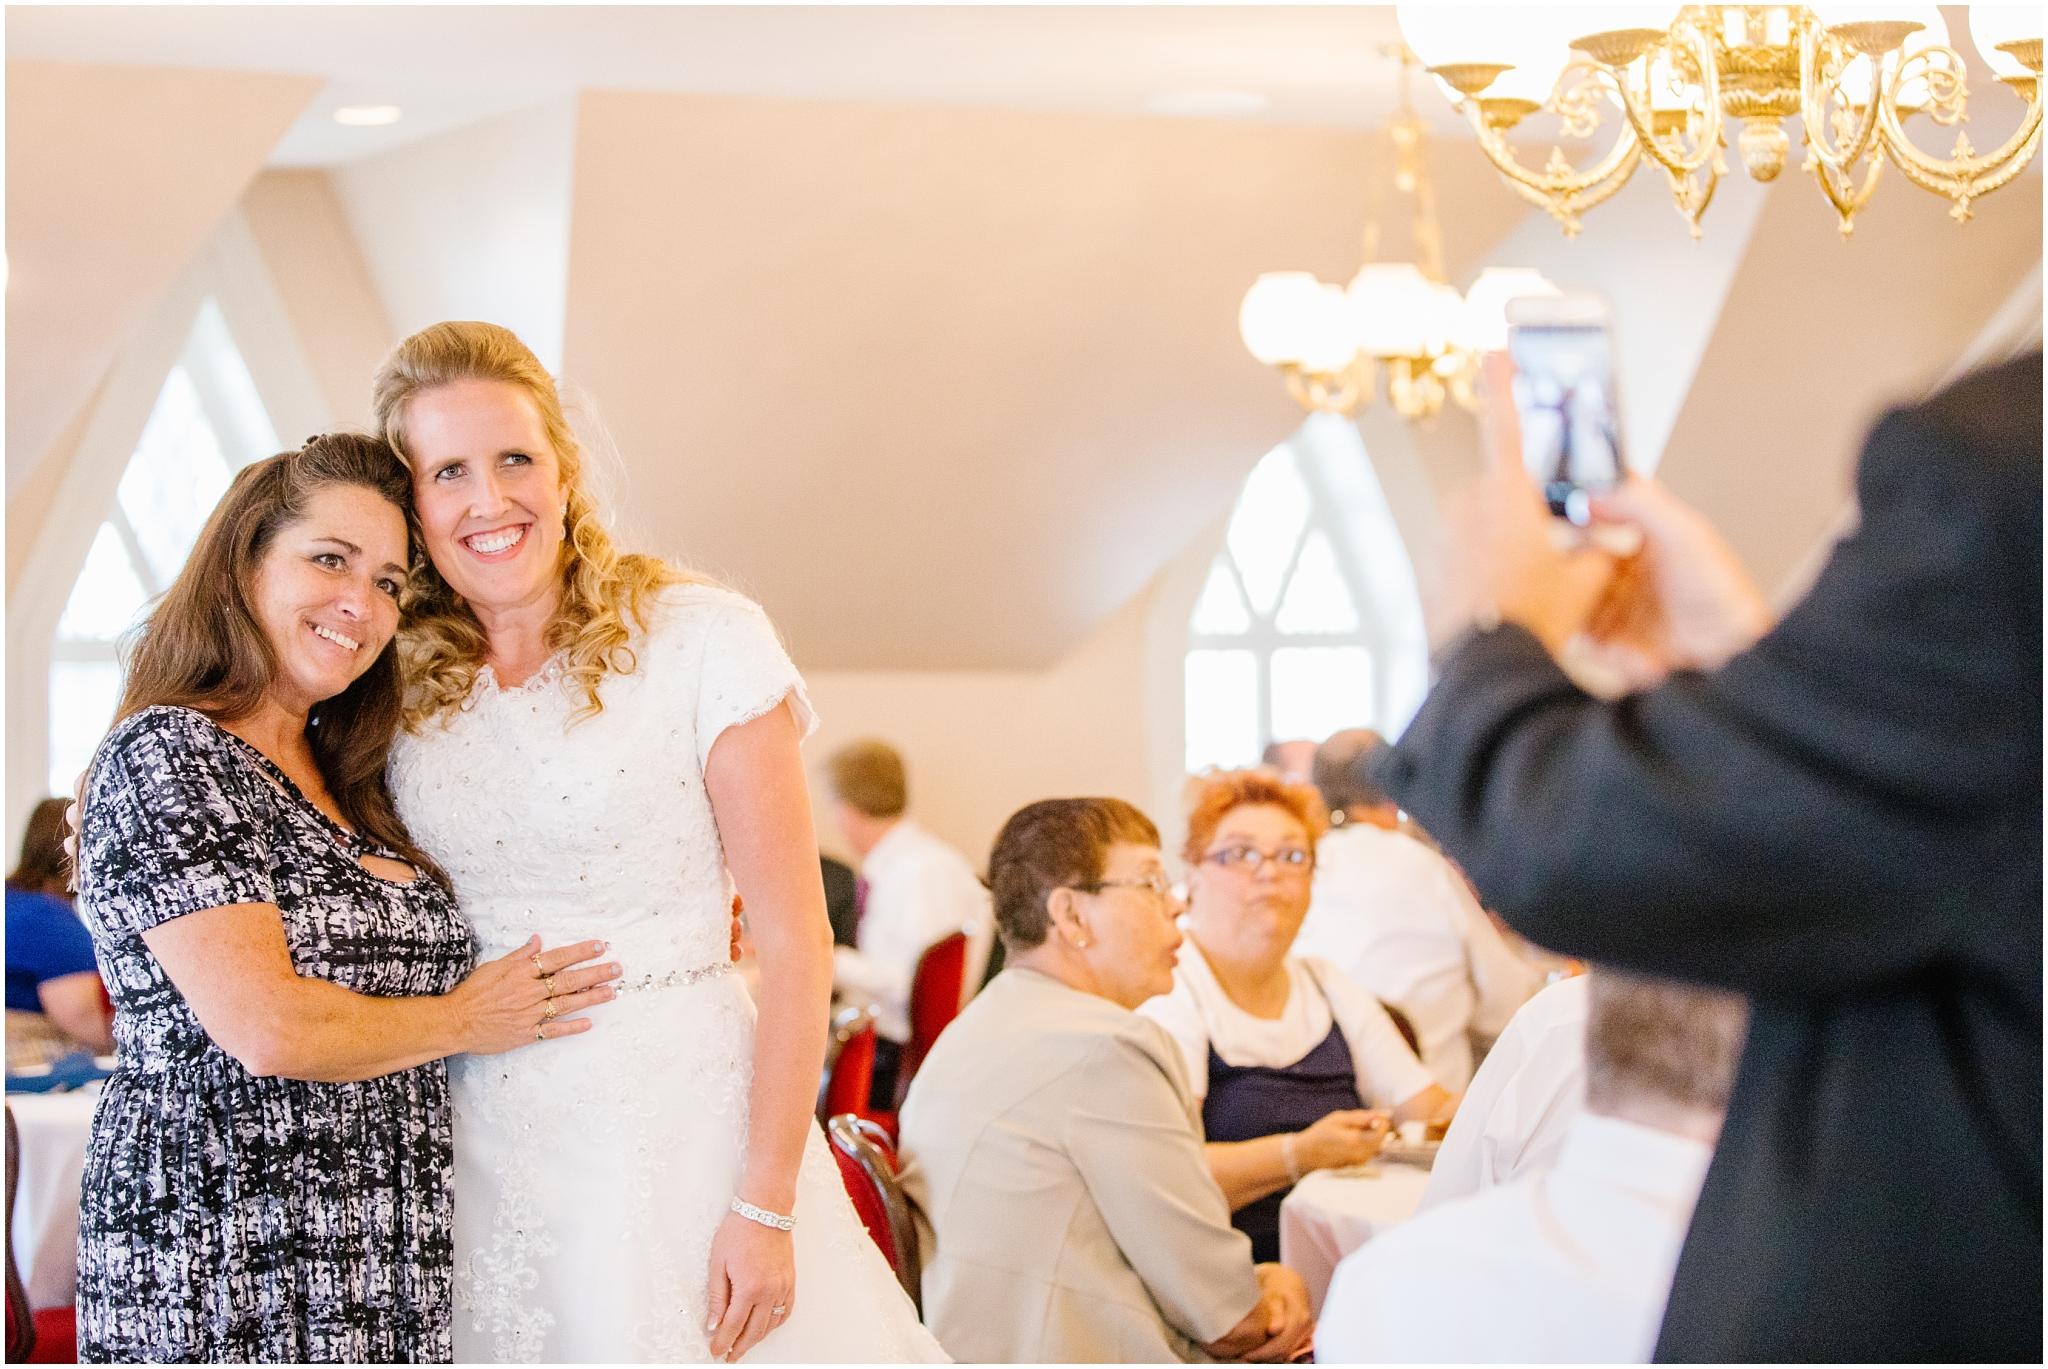 Justin and Melissa-271_Lizzie-B-Imagery-Utah-Wedding-Photographer-Salt-Lake-City-Temple-The-Grand-Ballroom.jpg